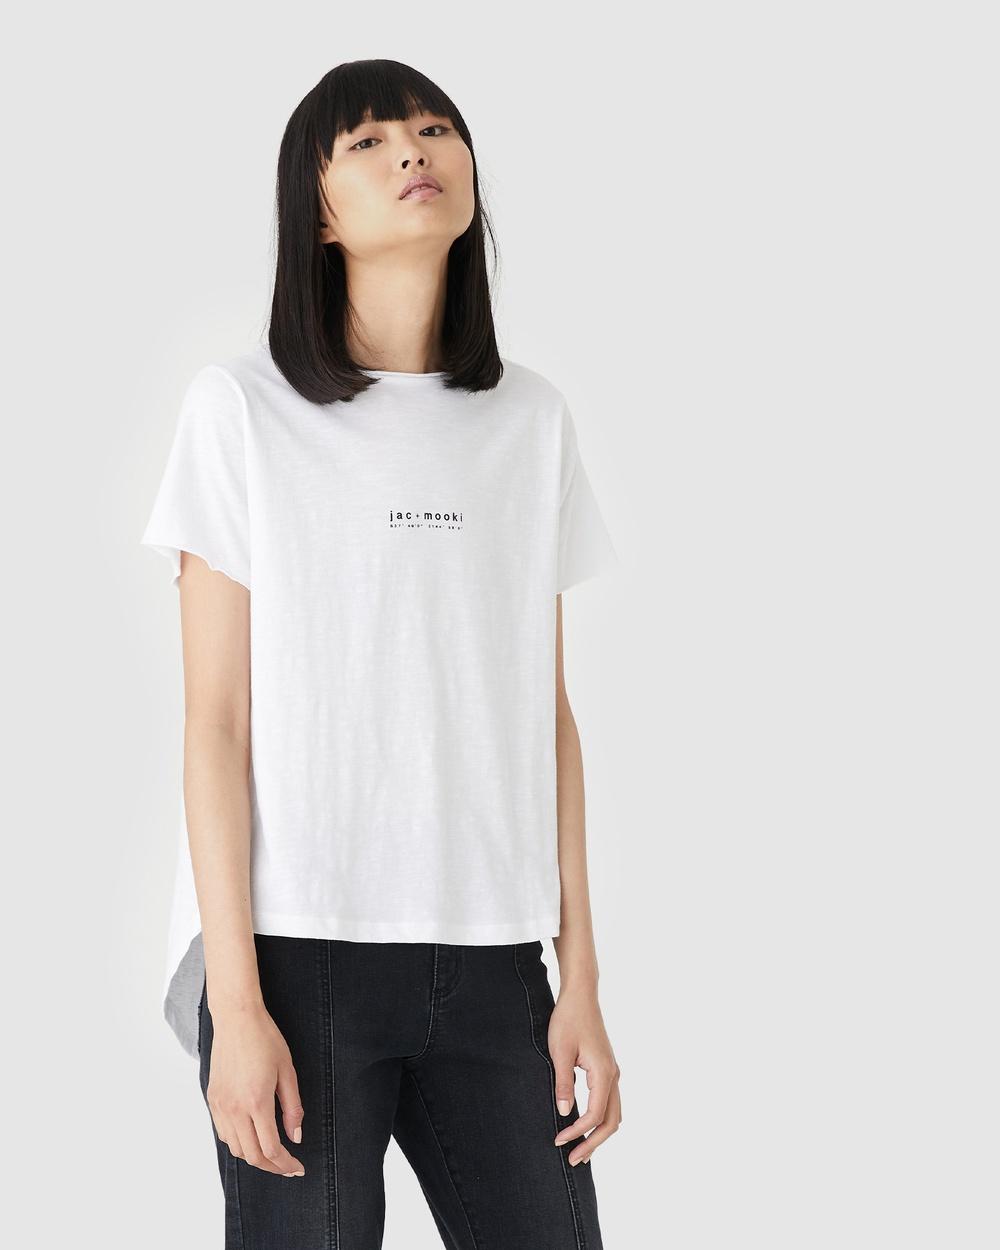 Jac & Mooki Kendall Tee T-Shirts Singlets white Australia